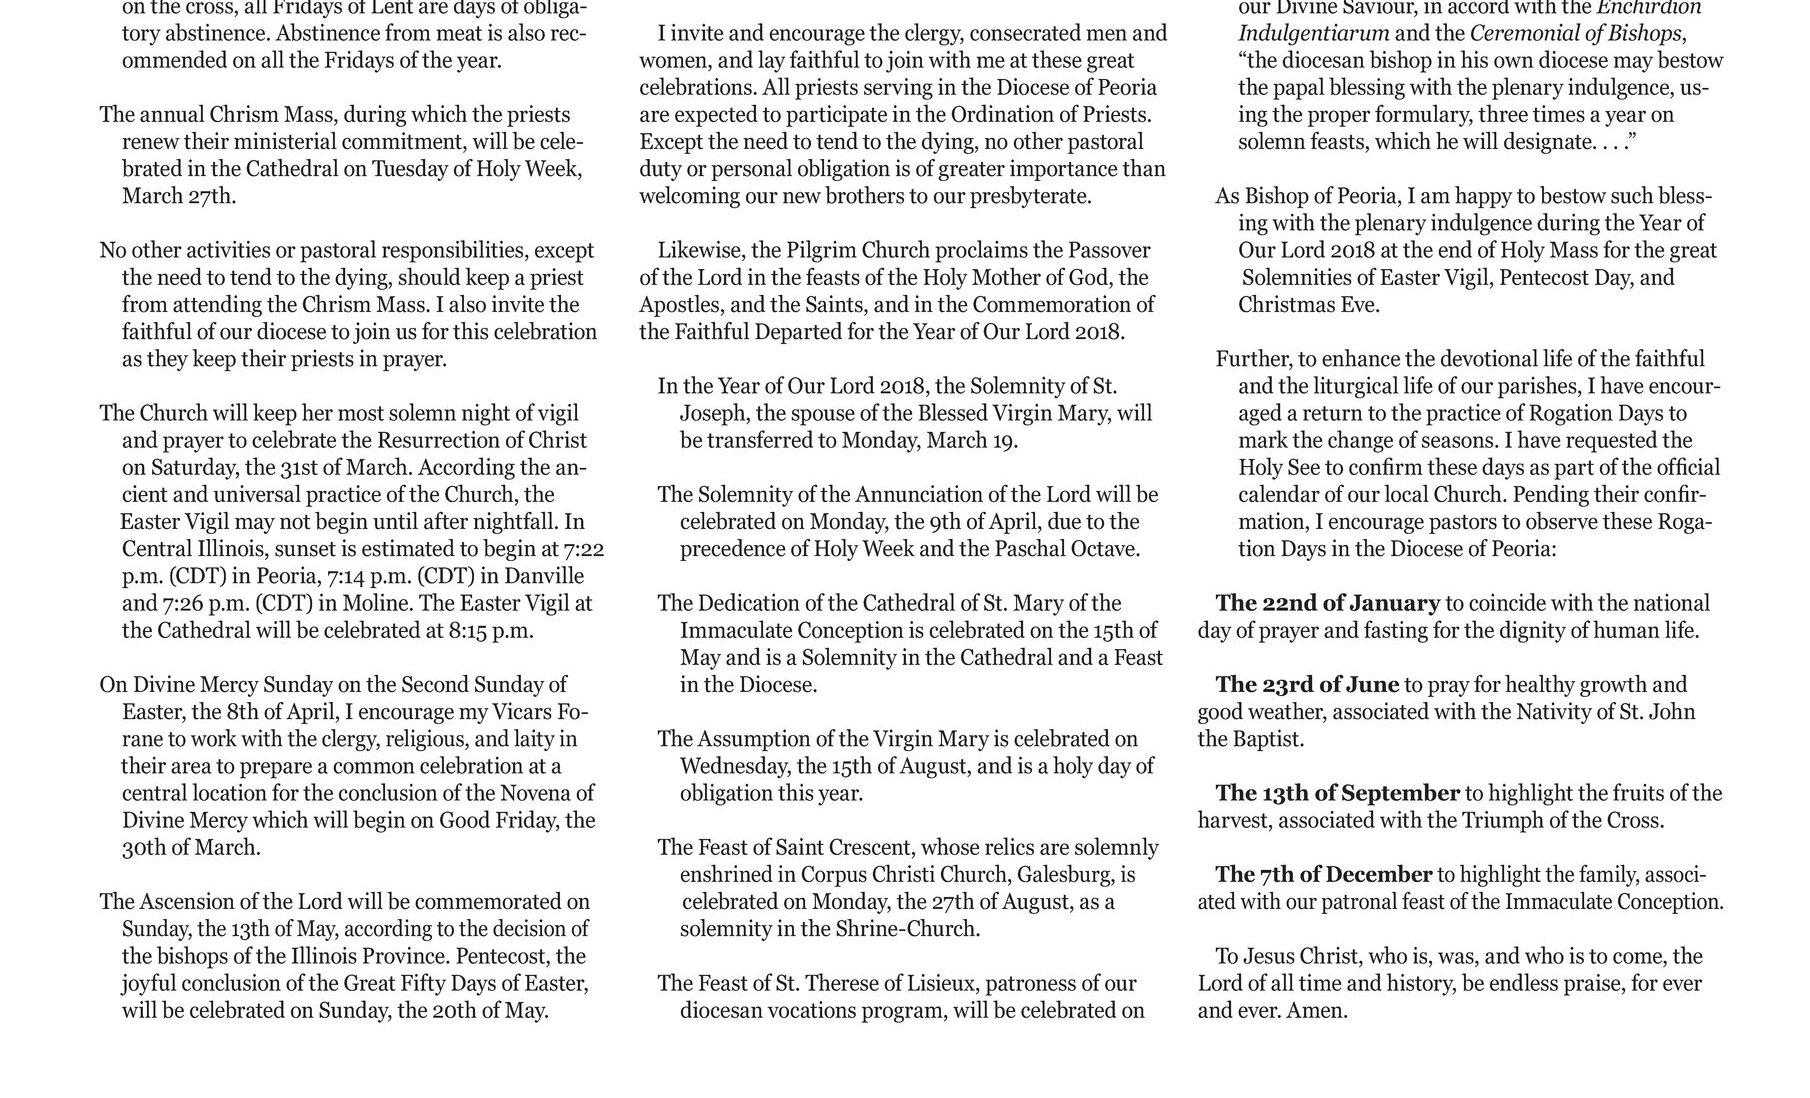 Page B4 - Catholic Post 12 03 2017 E Edition